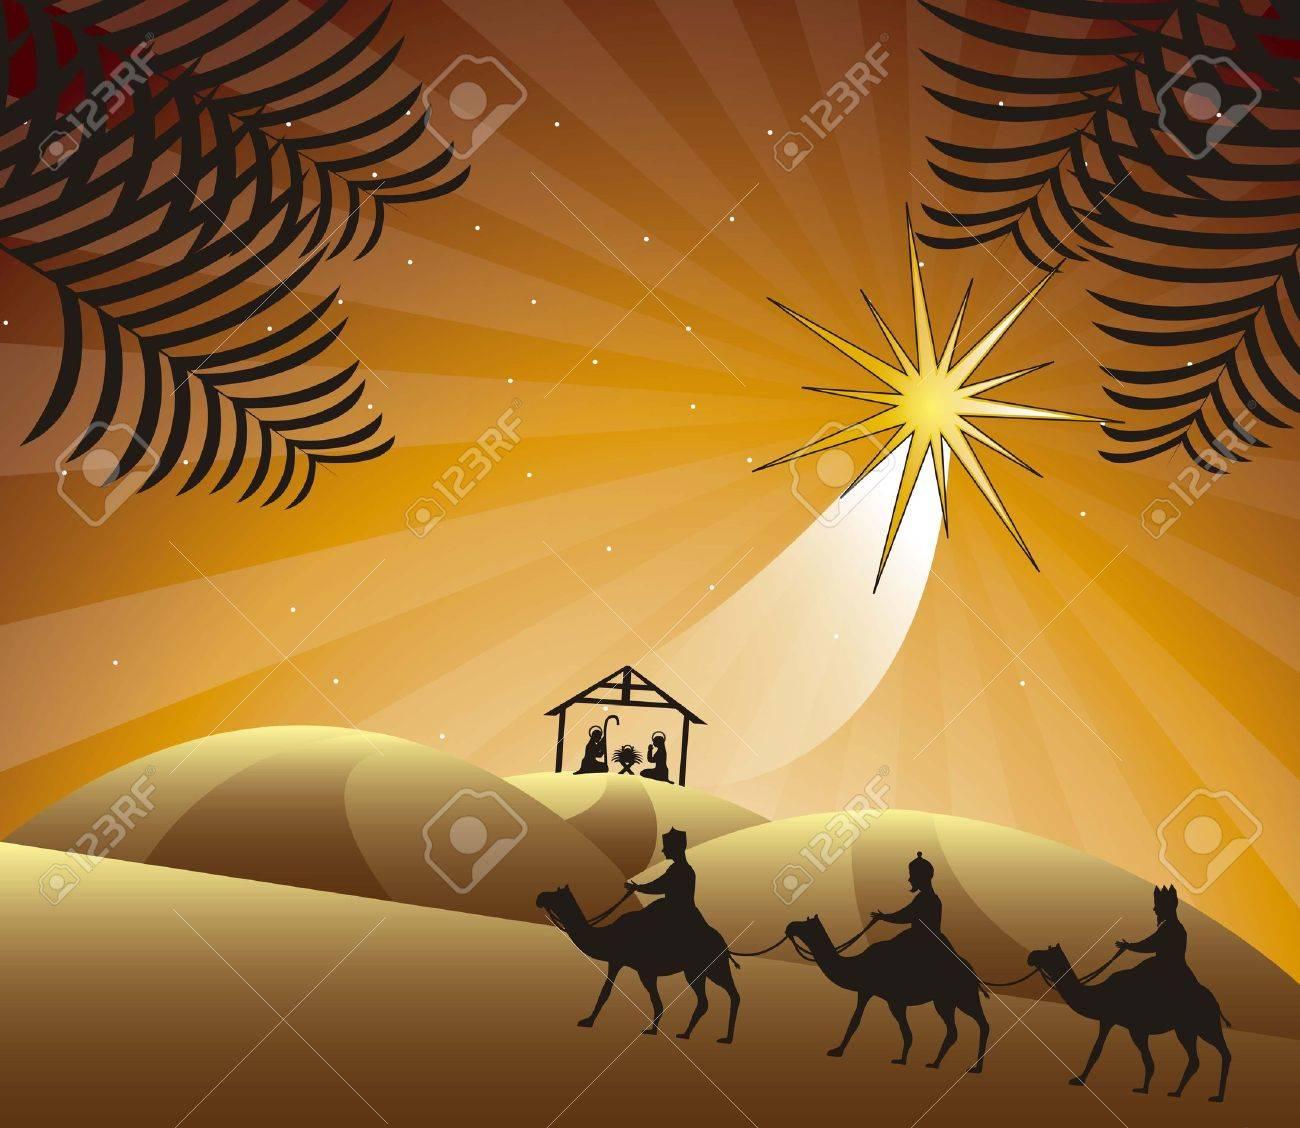 nativity scene with wise men. vector illustration - 15540148